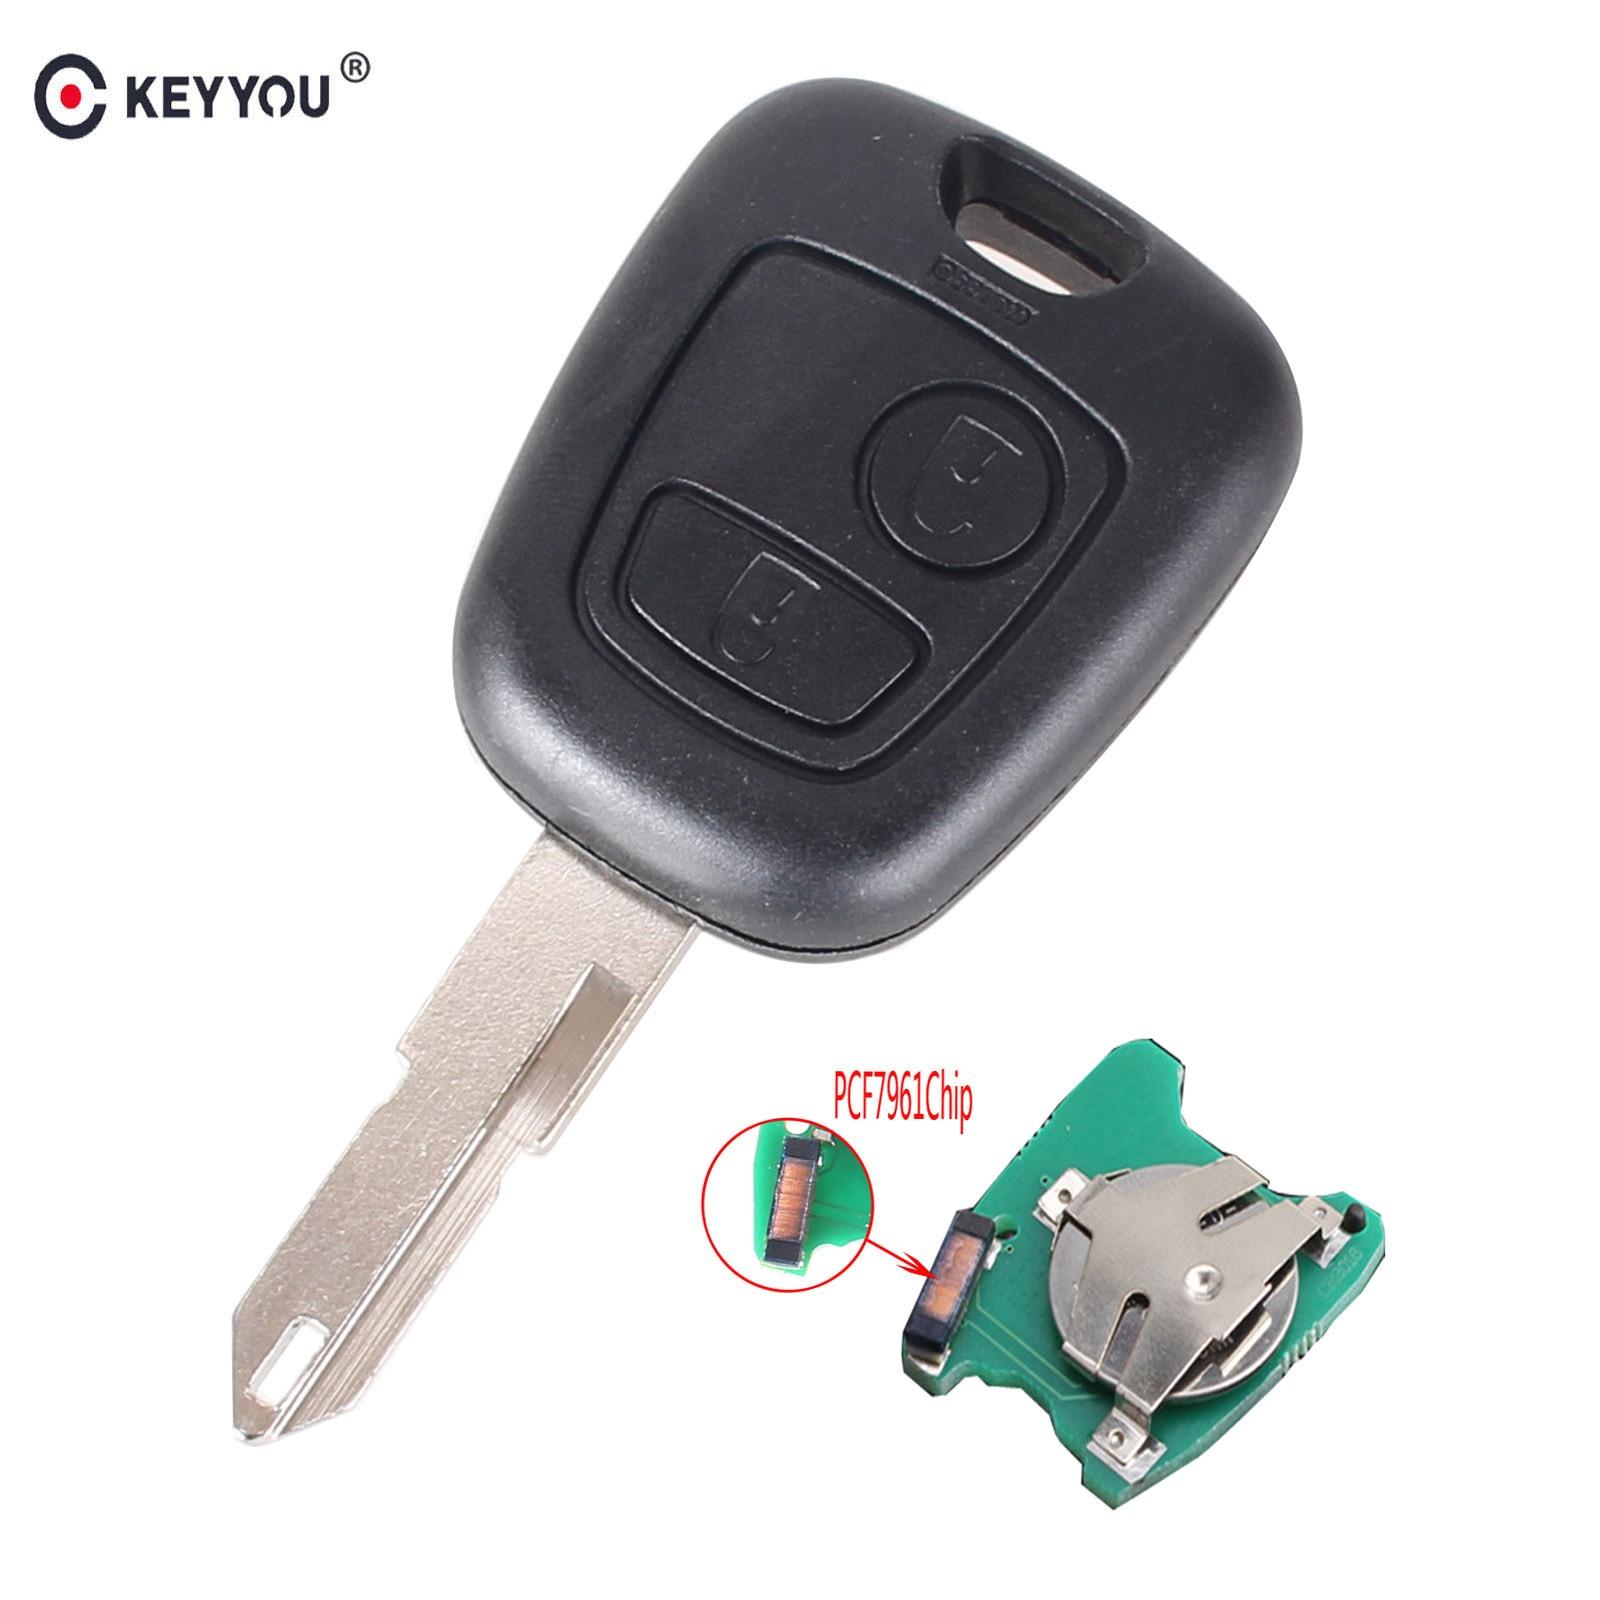 Кнопки KEYYOU 2 NE73 лезвие Брелок дистанционного контроллера для Пежо 206 433 МГц с чип Приемоответчика PCF7961